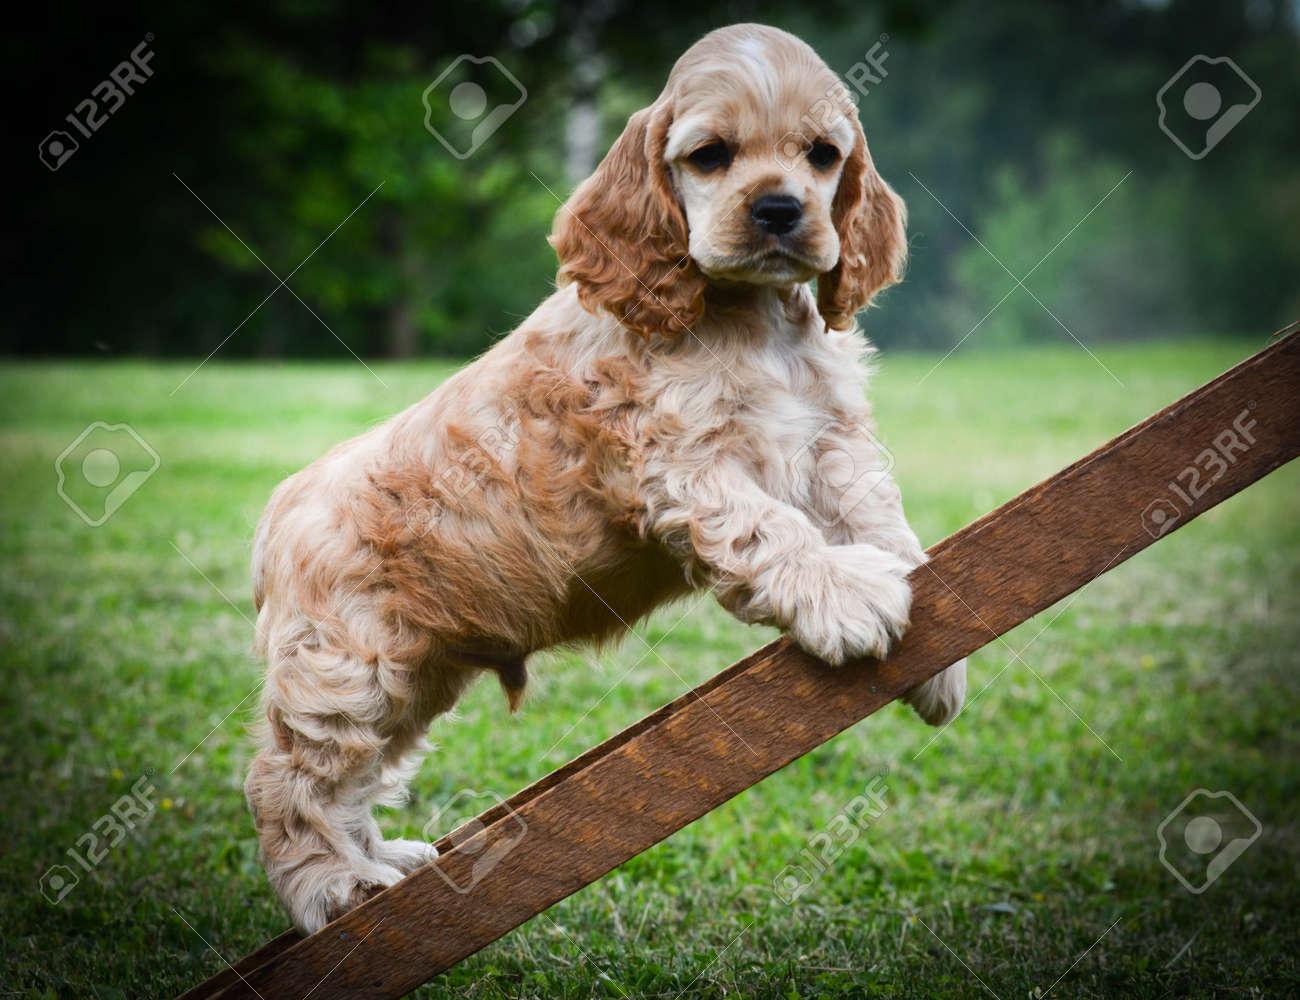 curious puppy climbing up a ladder american cocker spaniel stock